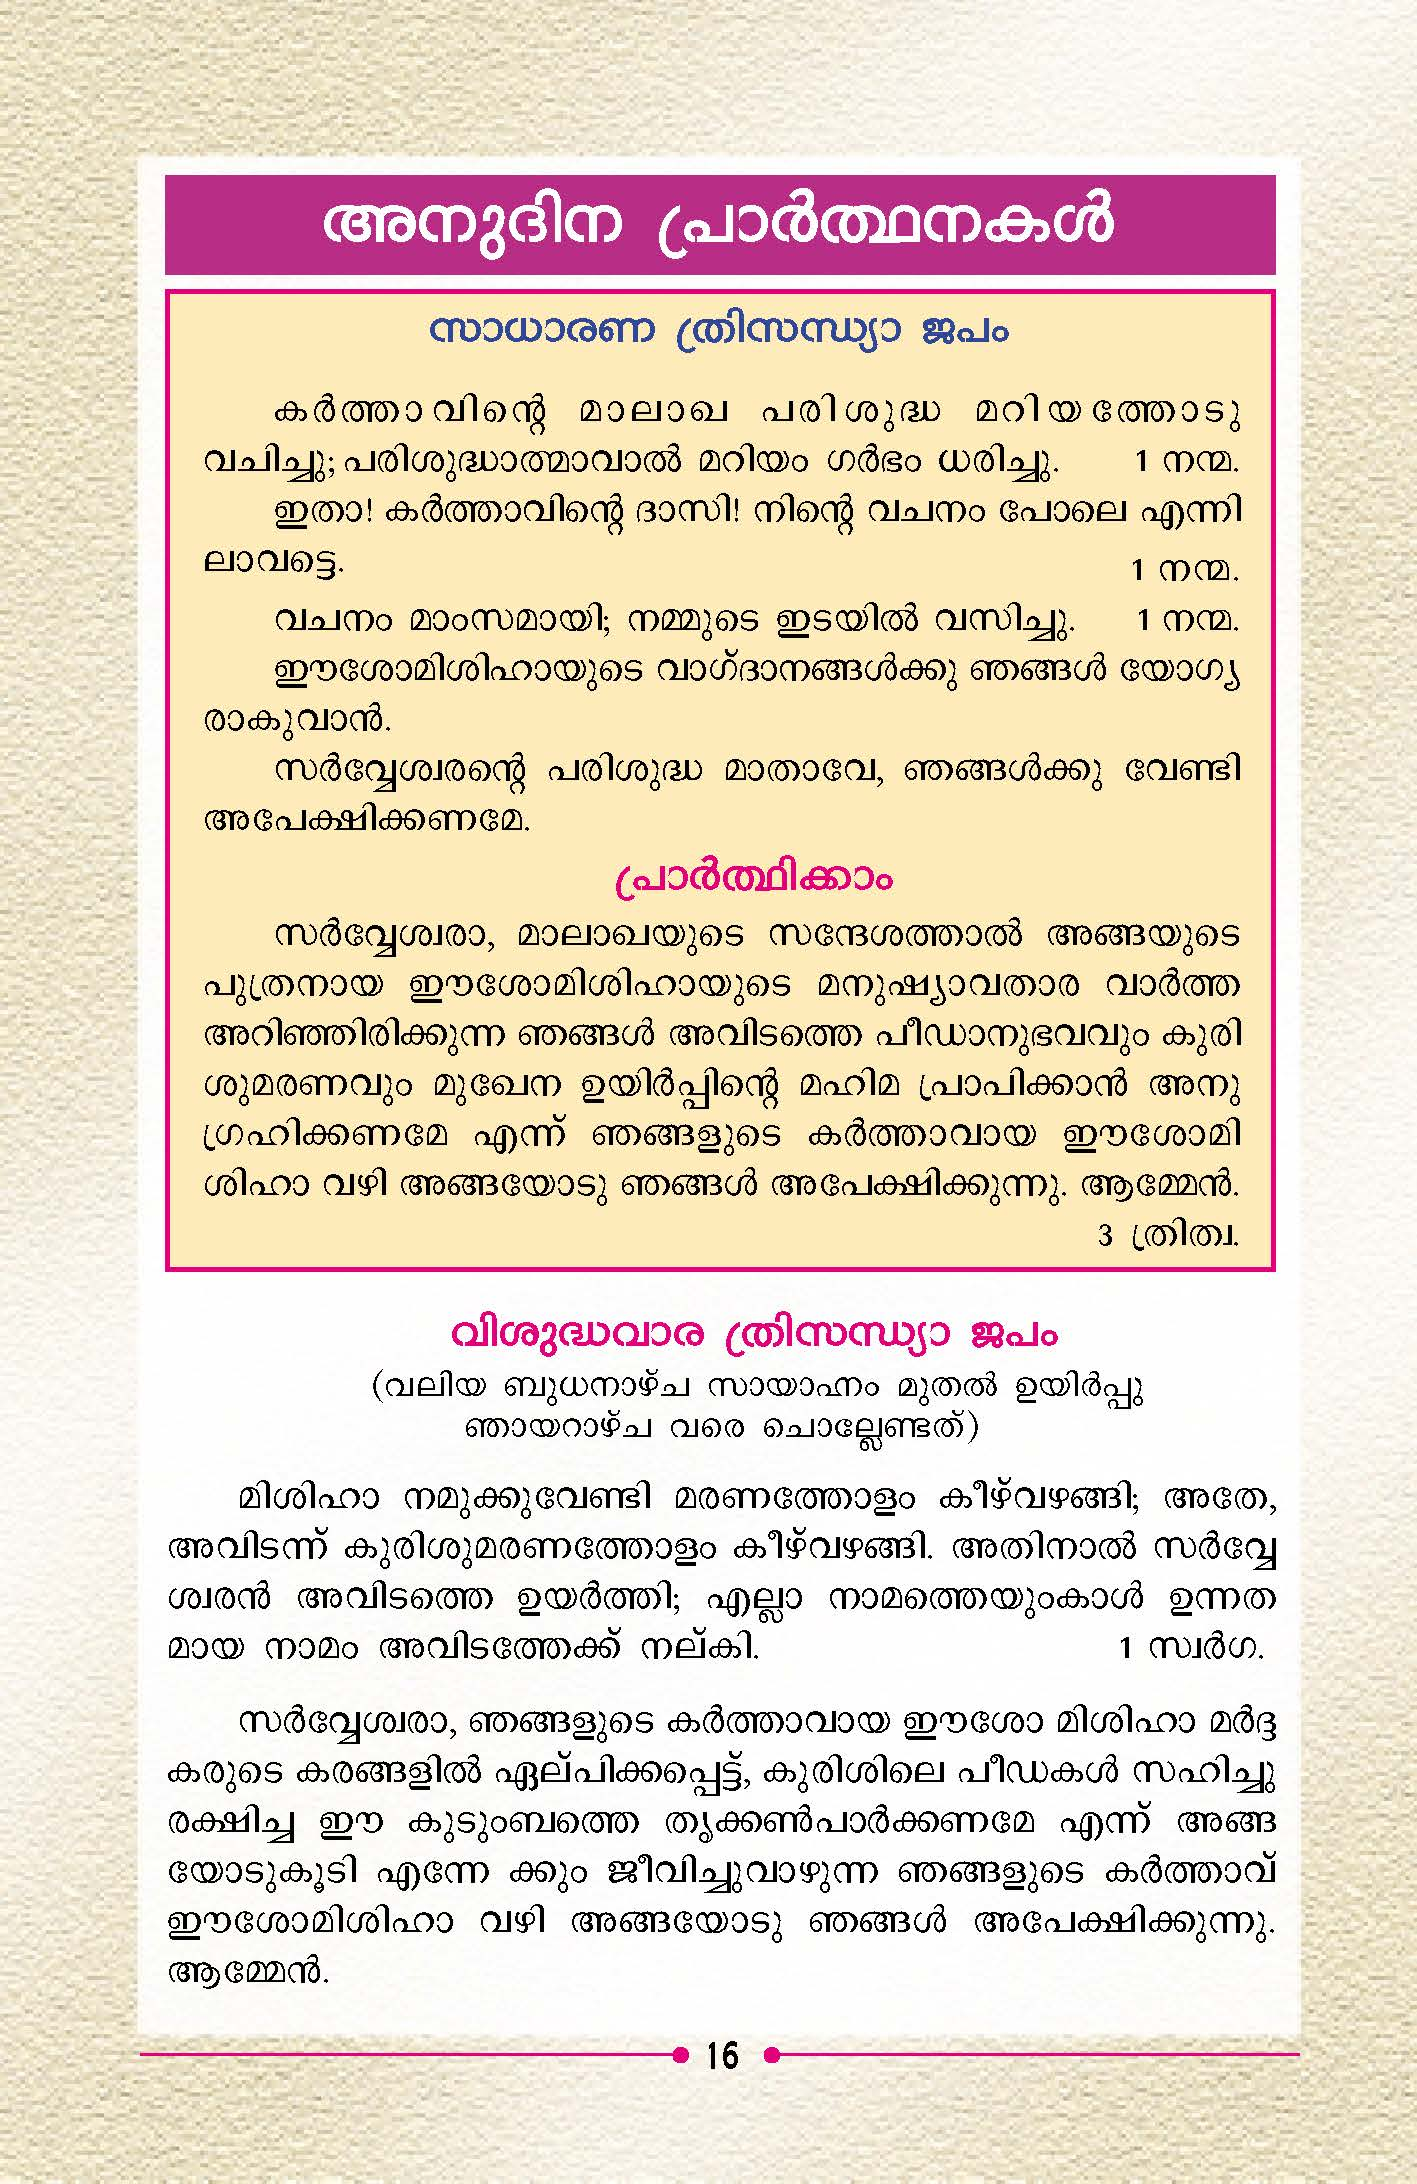 Malayalam Prayers My Prayers Are With You